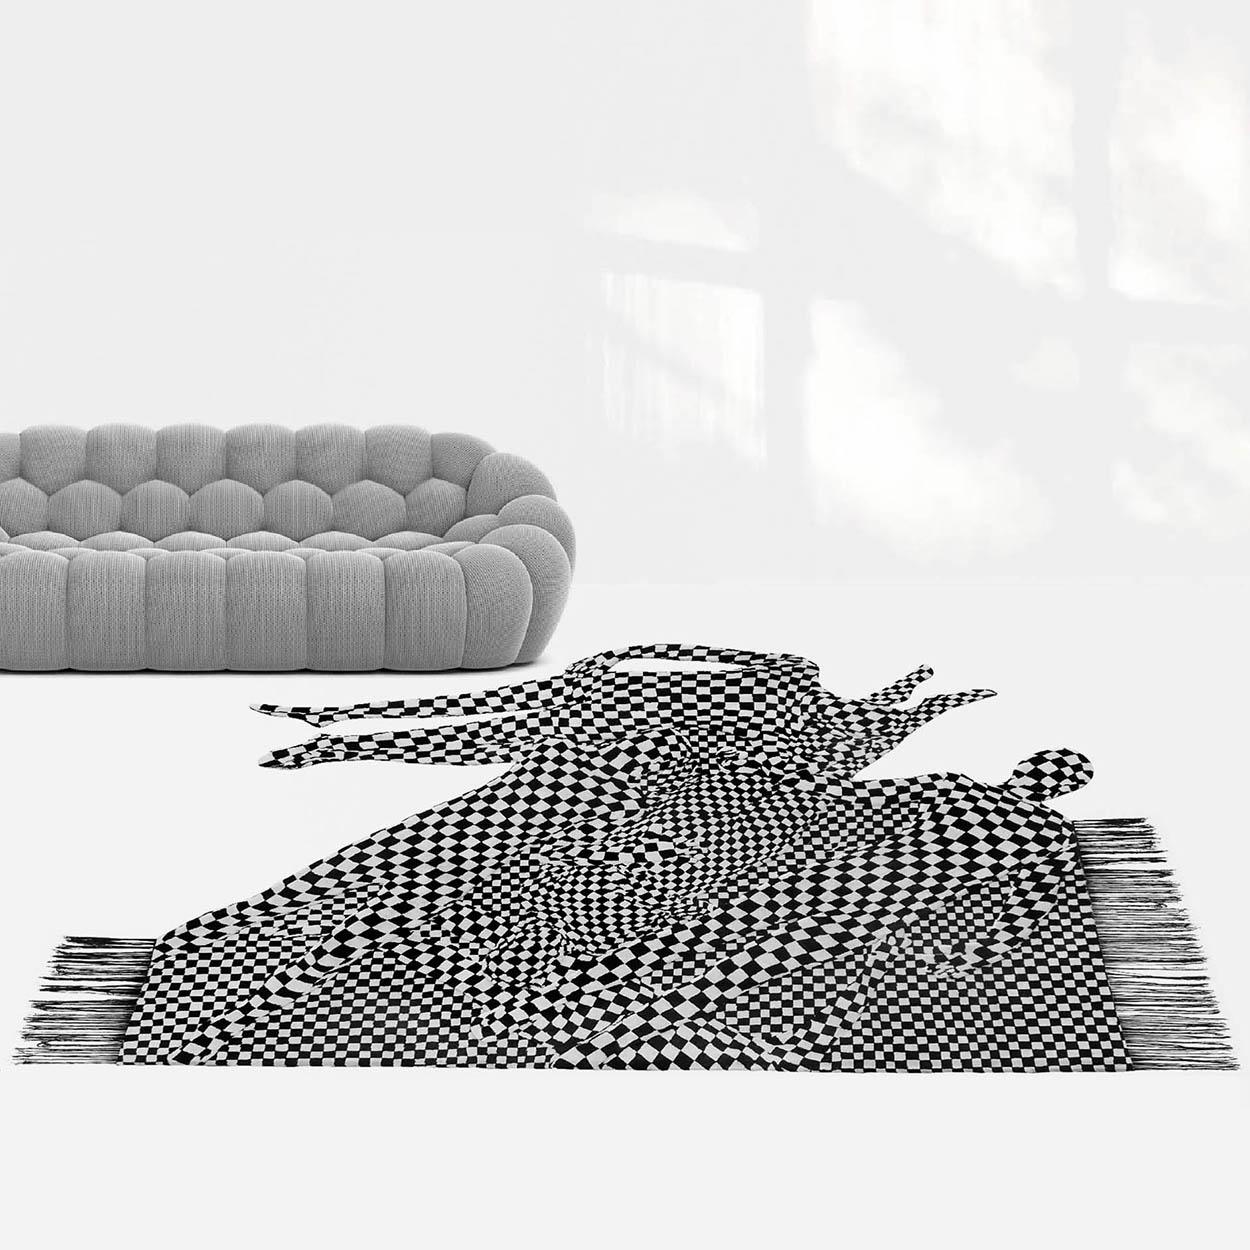 HENZEL STUDIO x Olaf Breuning Black and white people pattern in-situ.JPG